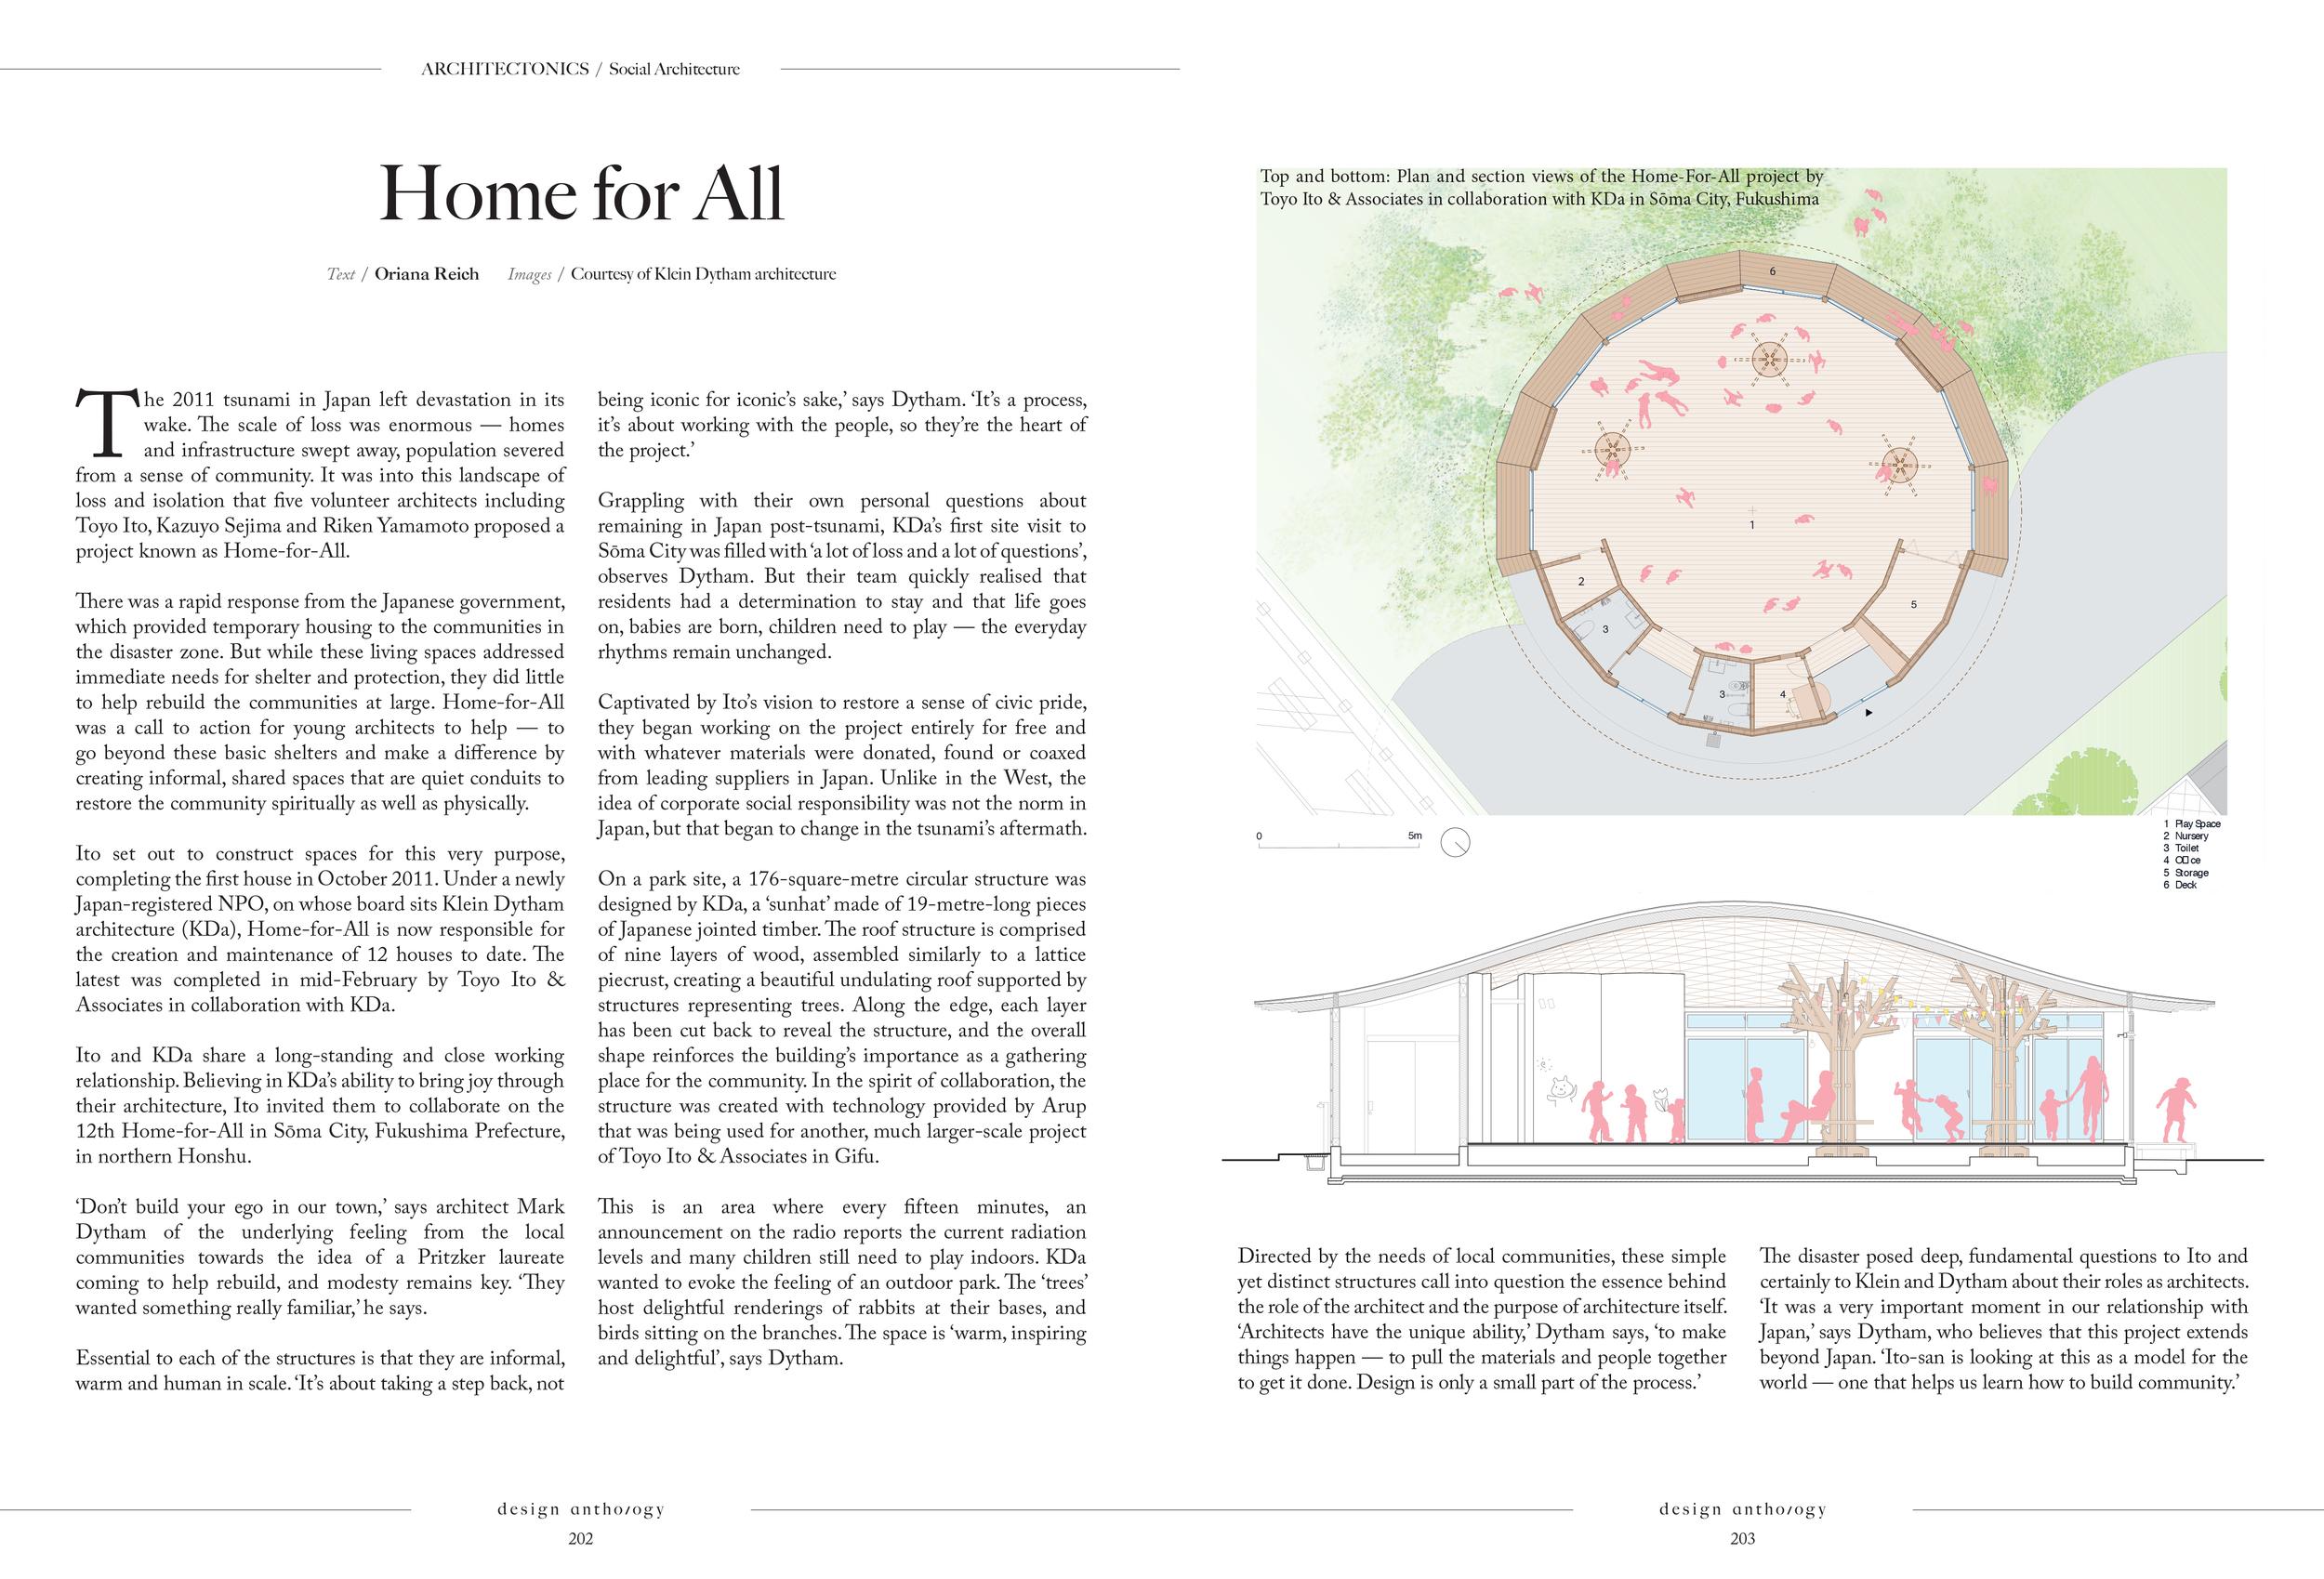 DA5_Architectonics_Social Architecture-1.jpg